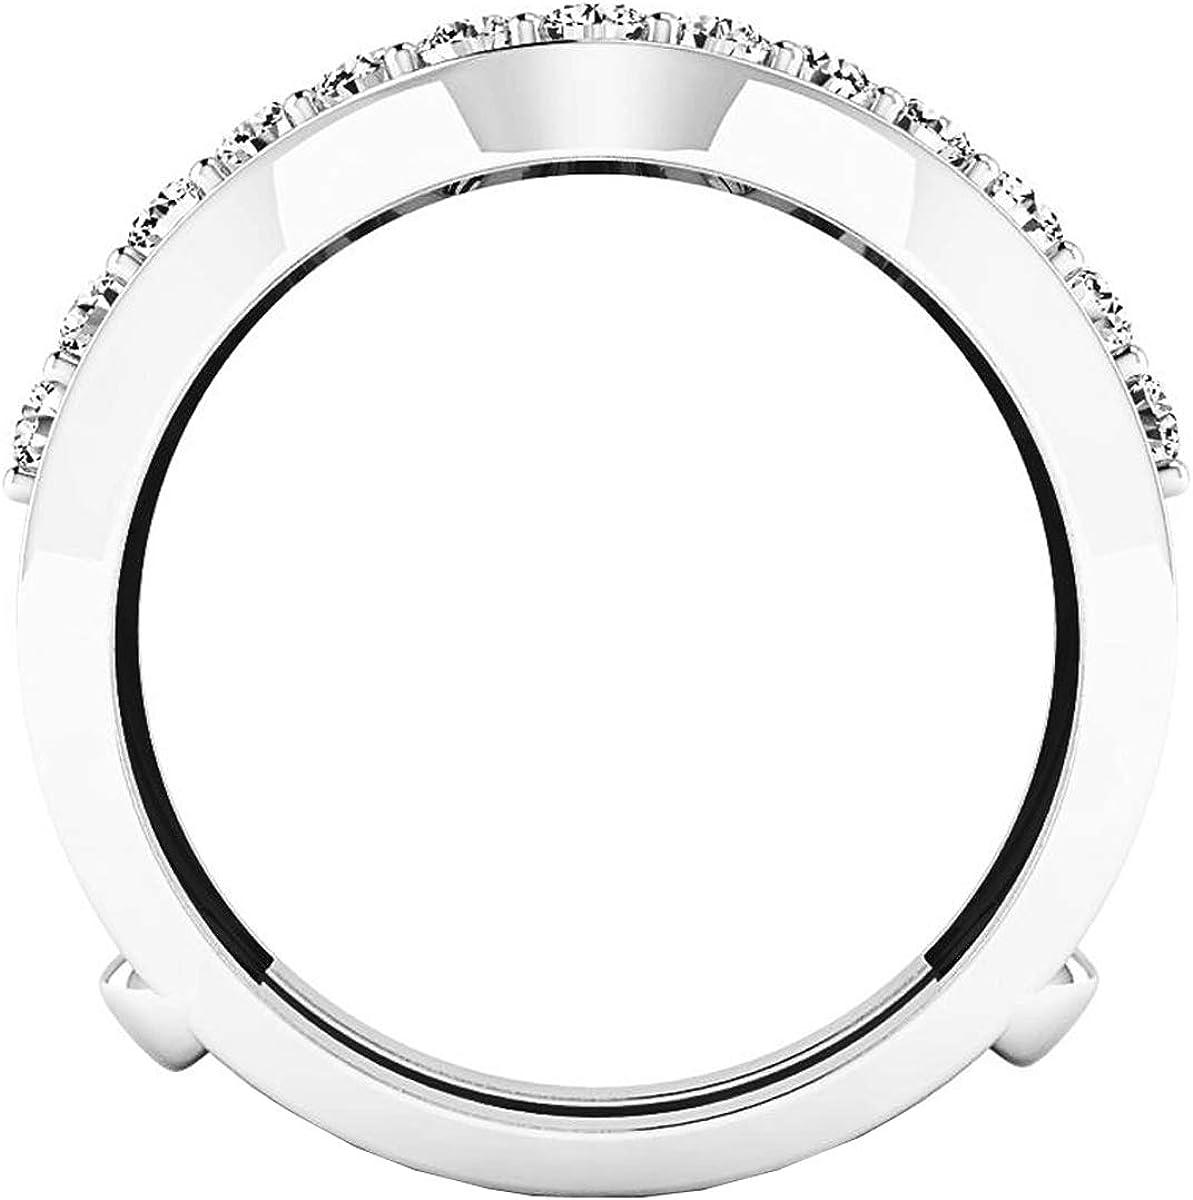 Dazzlingrock Collection 1.60 Carat (ctw) 10K Gold Round Lab Grown Diamond Ladies Wedding Double Enhancer Guard Ring